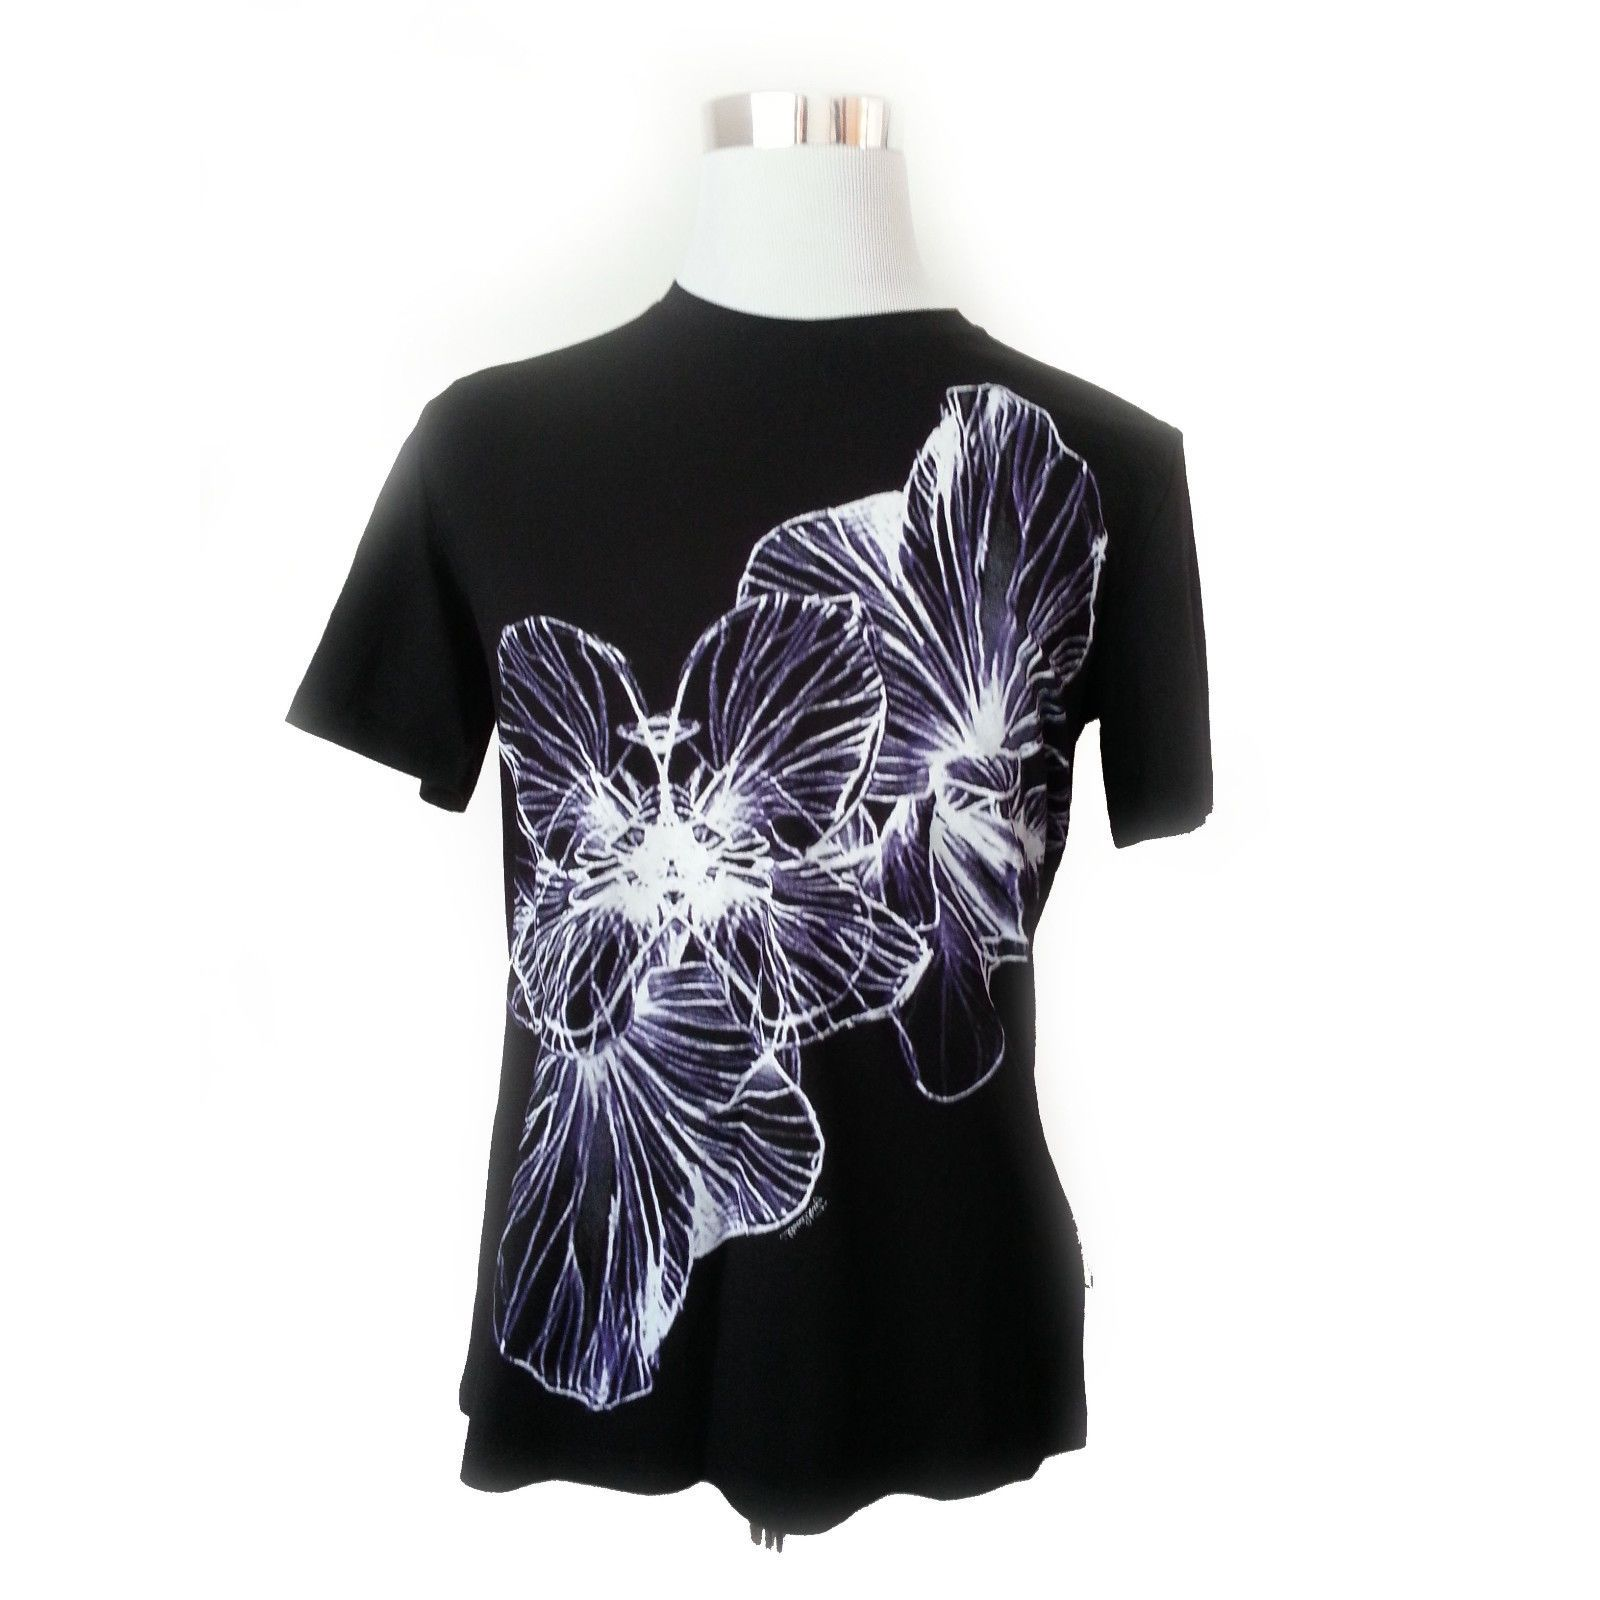 Black t shirt ebay -  Ebay Sale Men Graphic Tee By Just Cavalli Black Cotton Blend Men S T Shirt